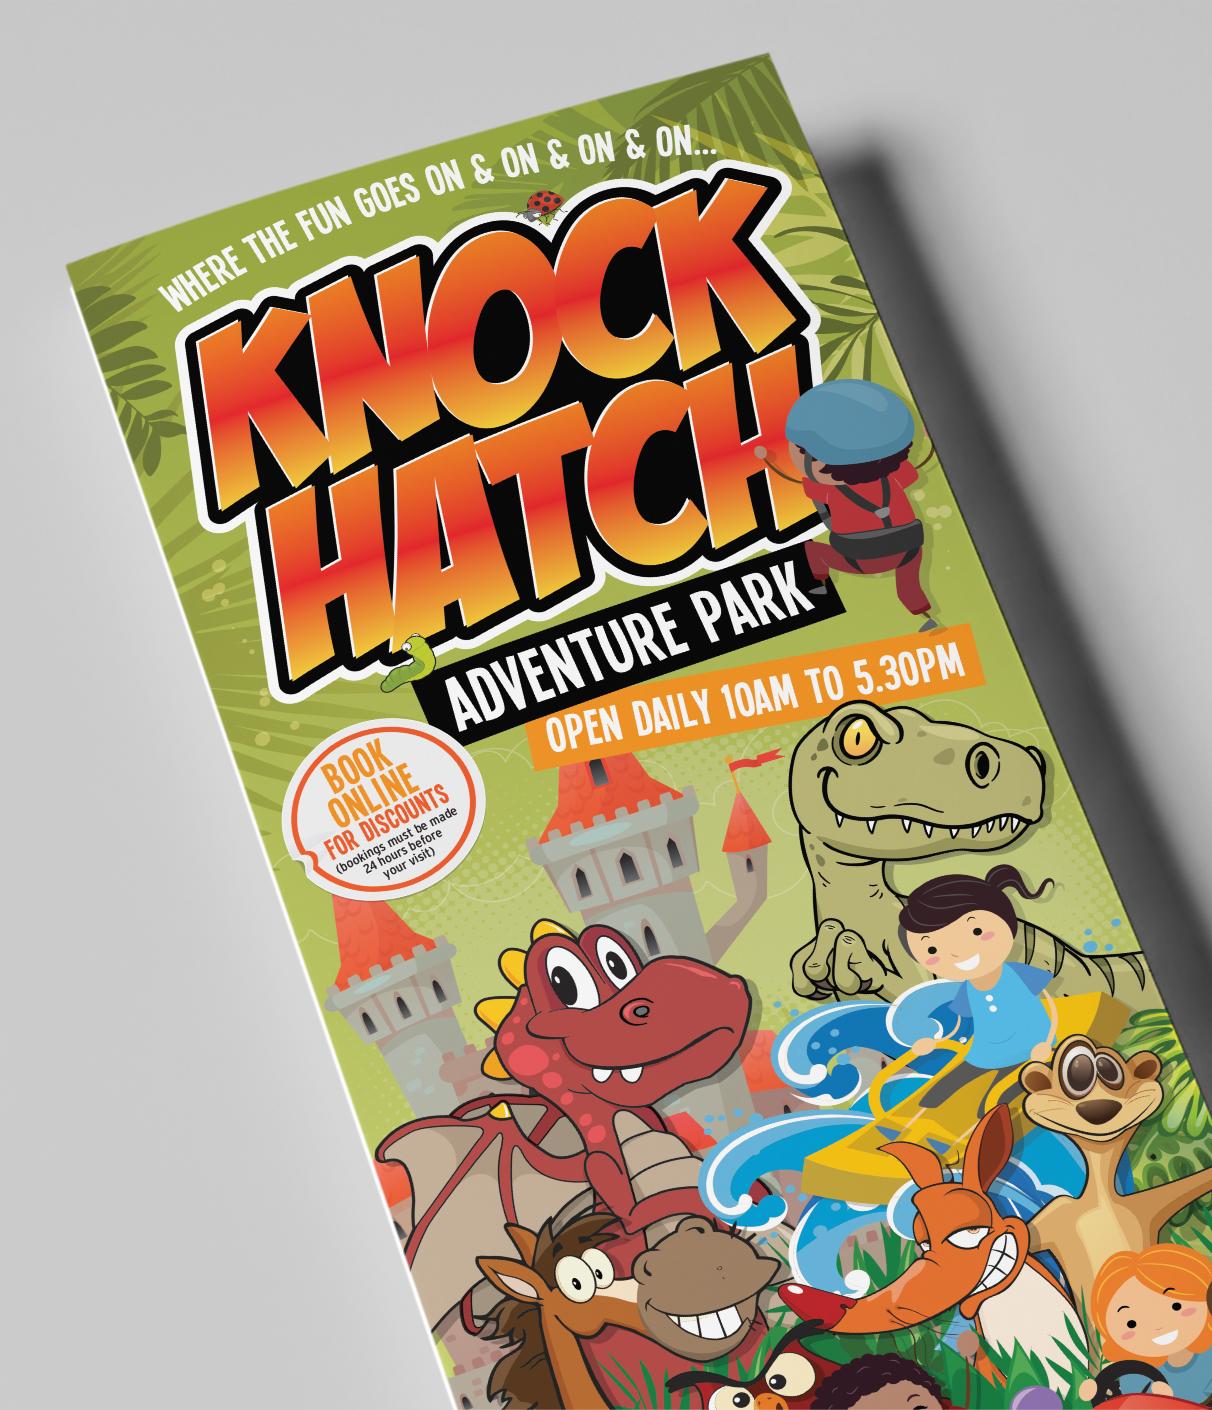 knockhatch-leaflet